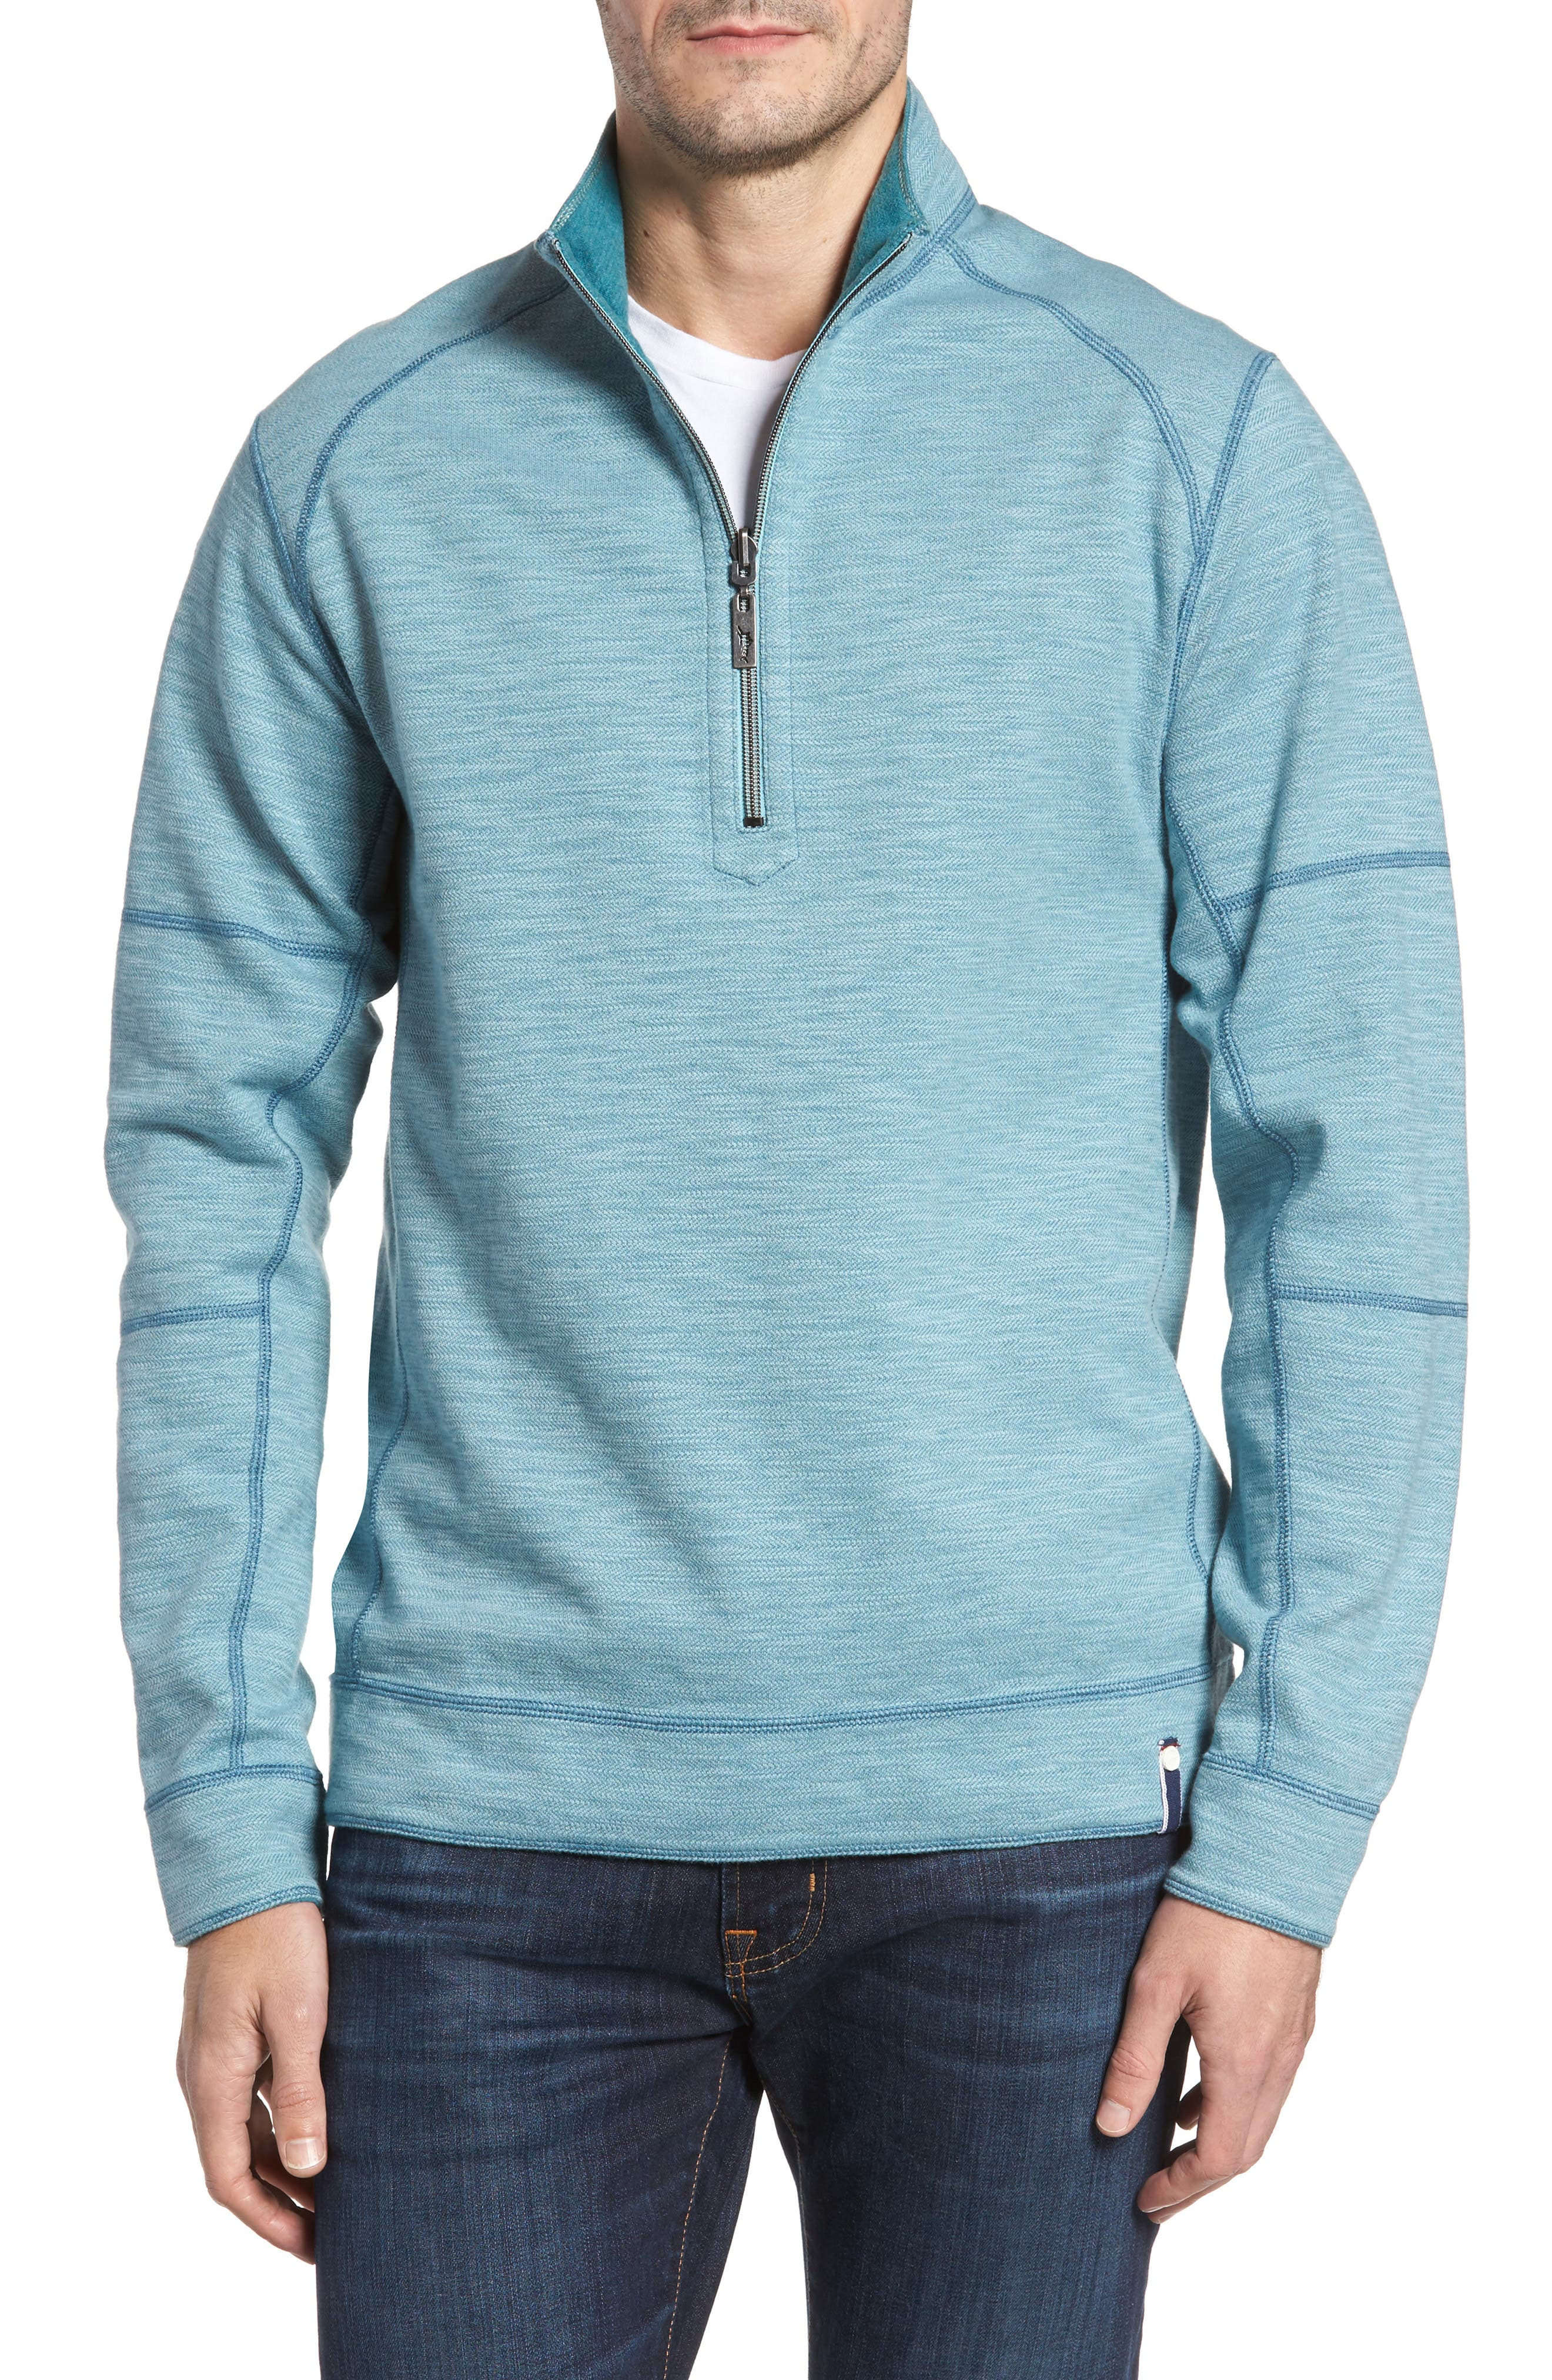 Sandbar Slub Reversible Quarter Zip Pullover,                             Main thumbnail 3, color,